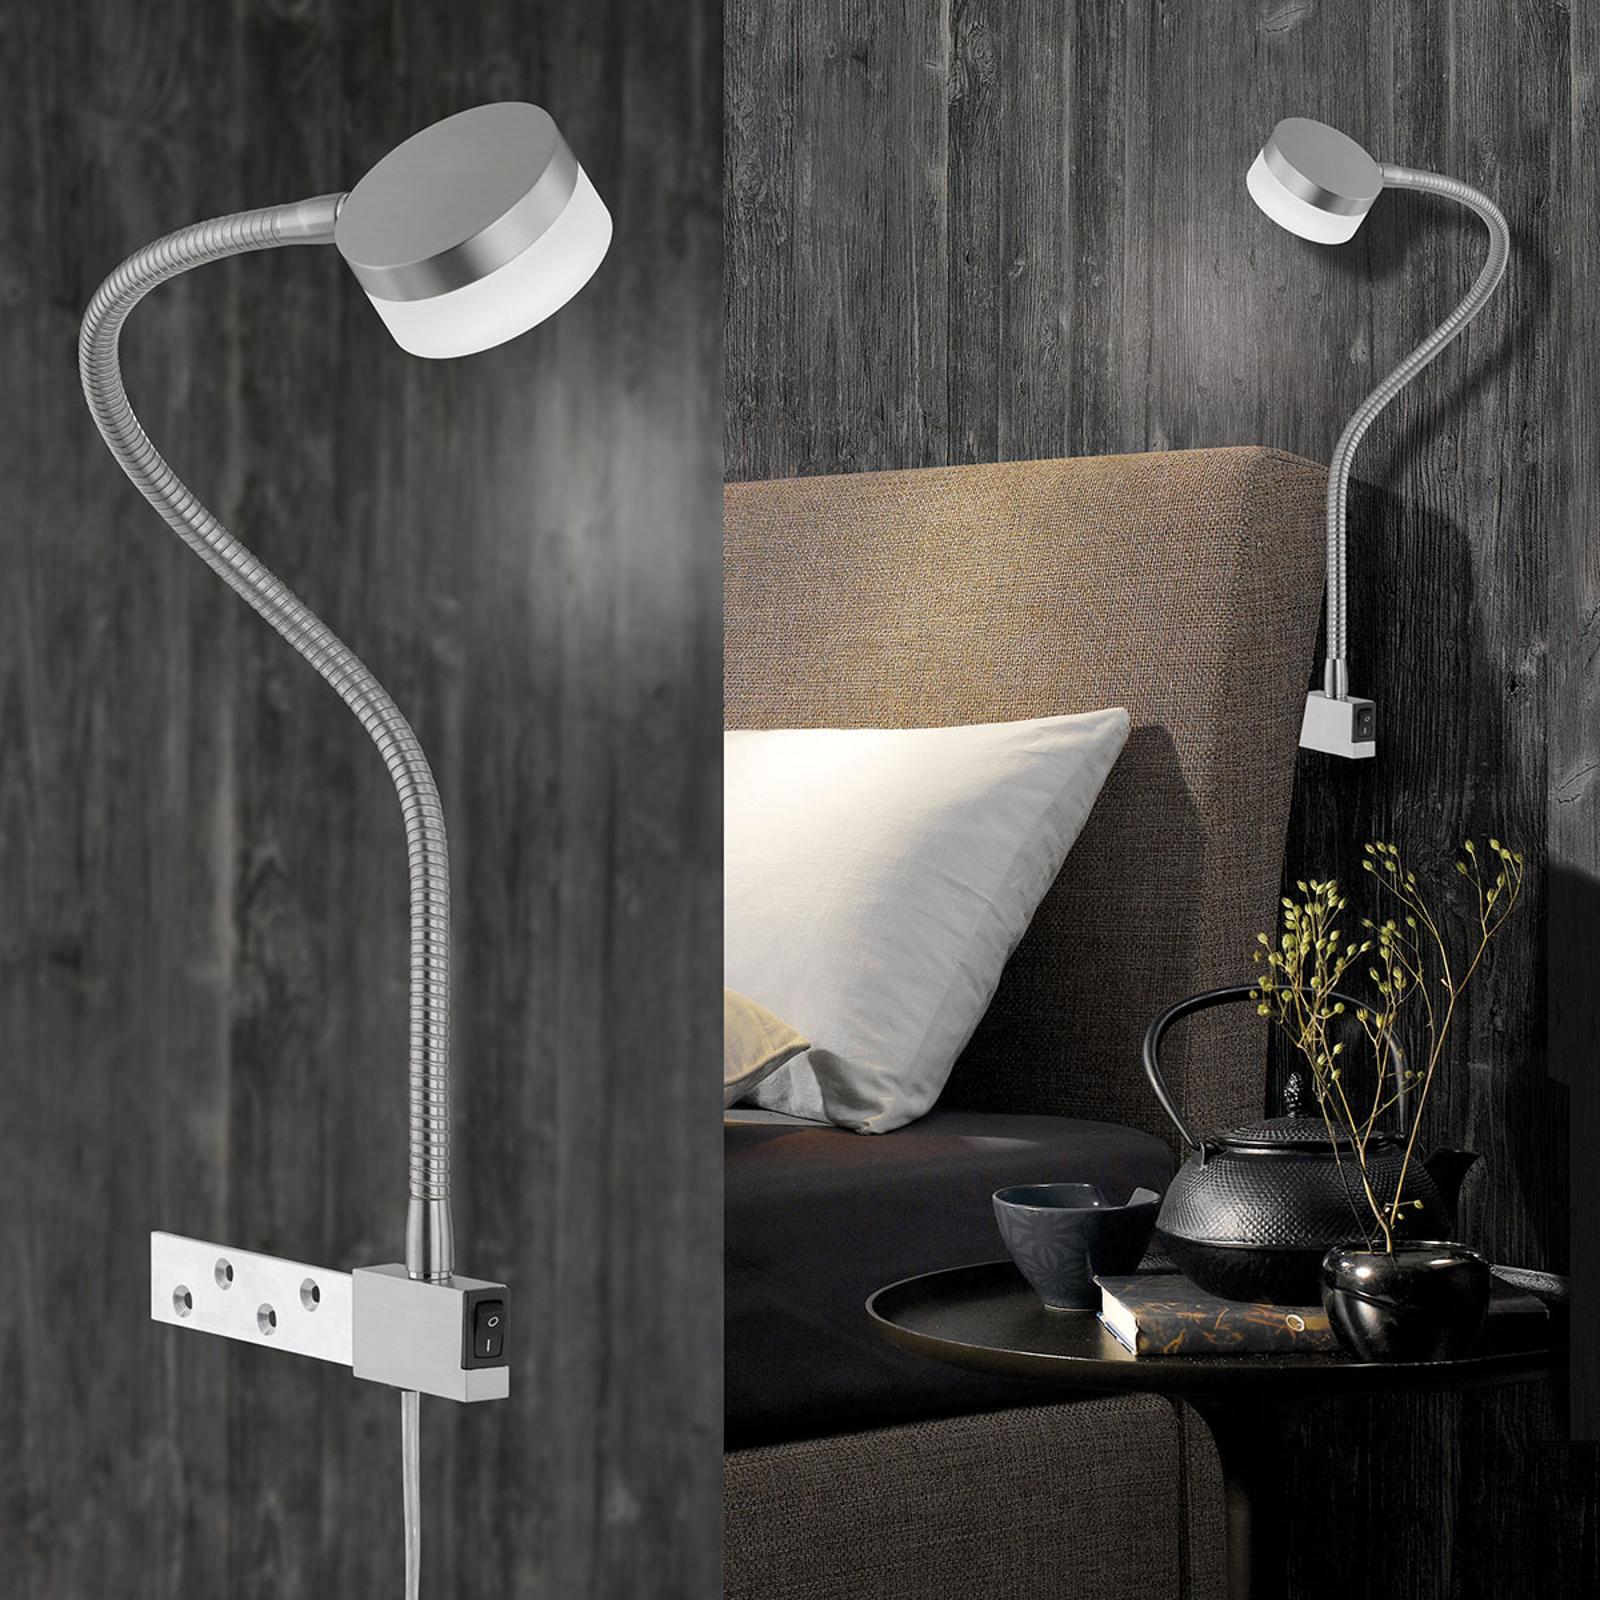 Verstellbare LED-Klemmleuchte Lug